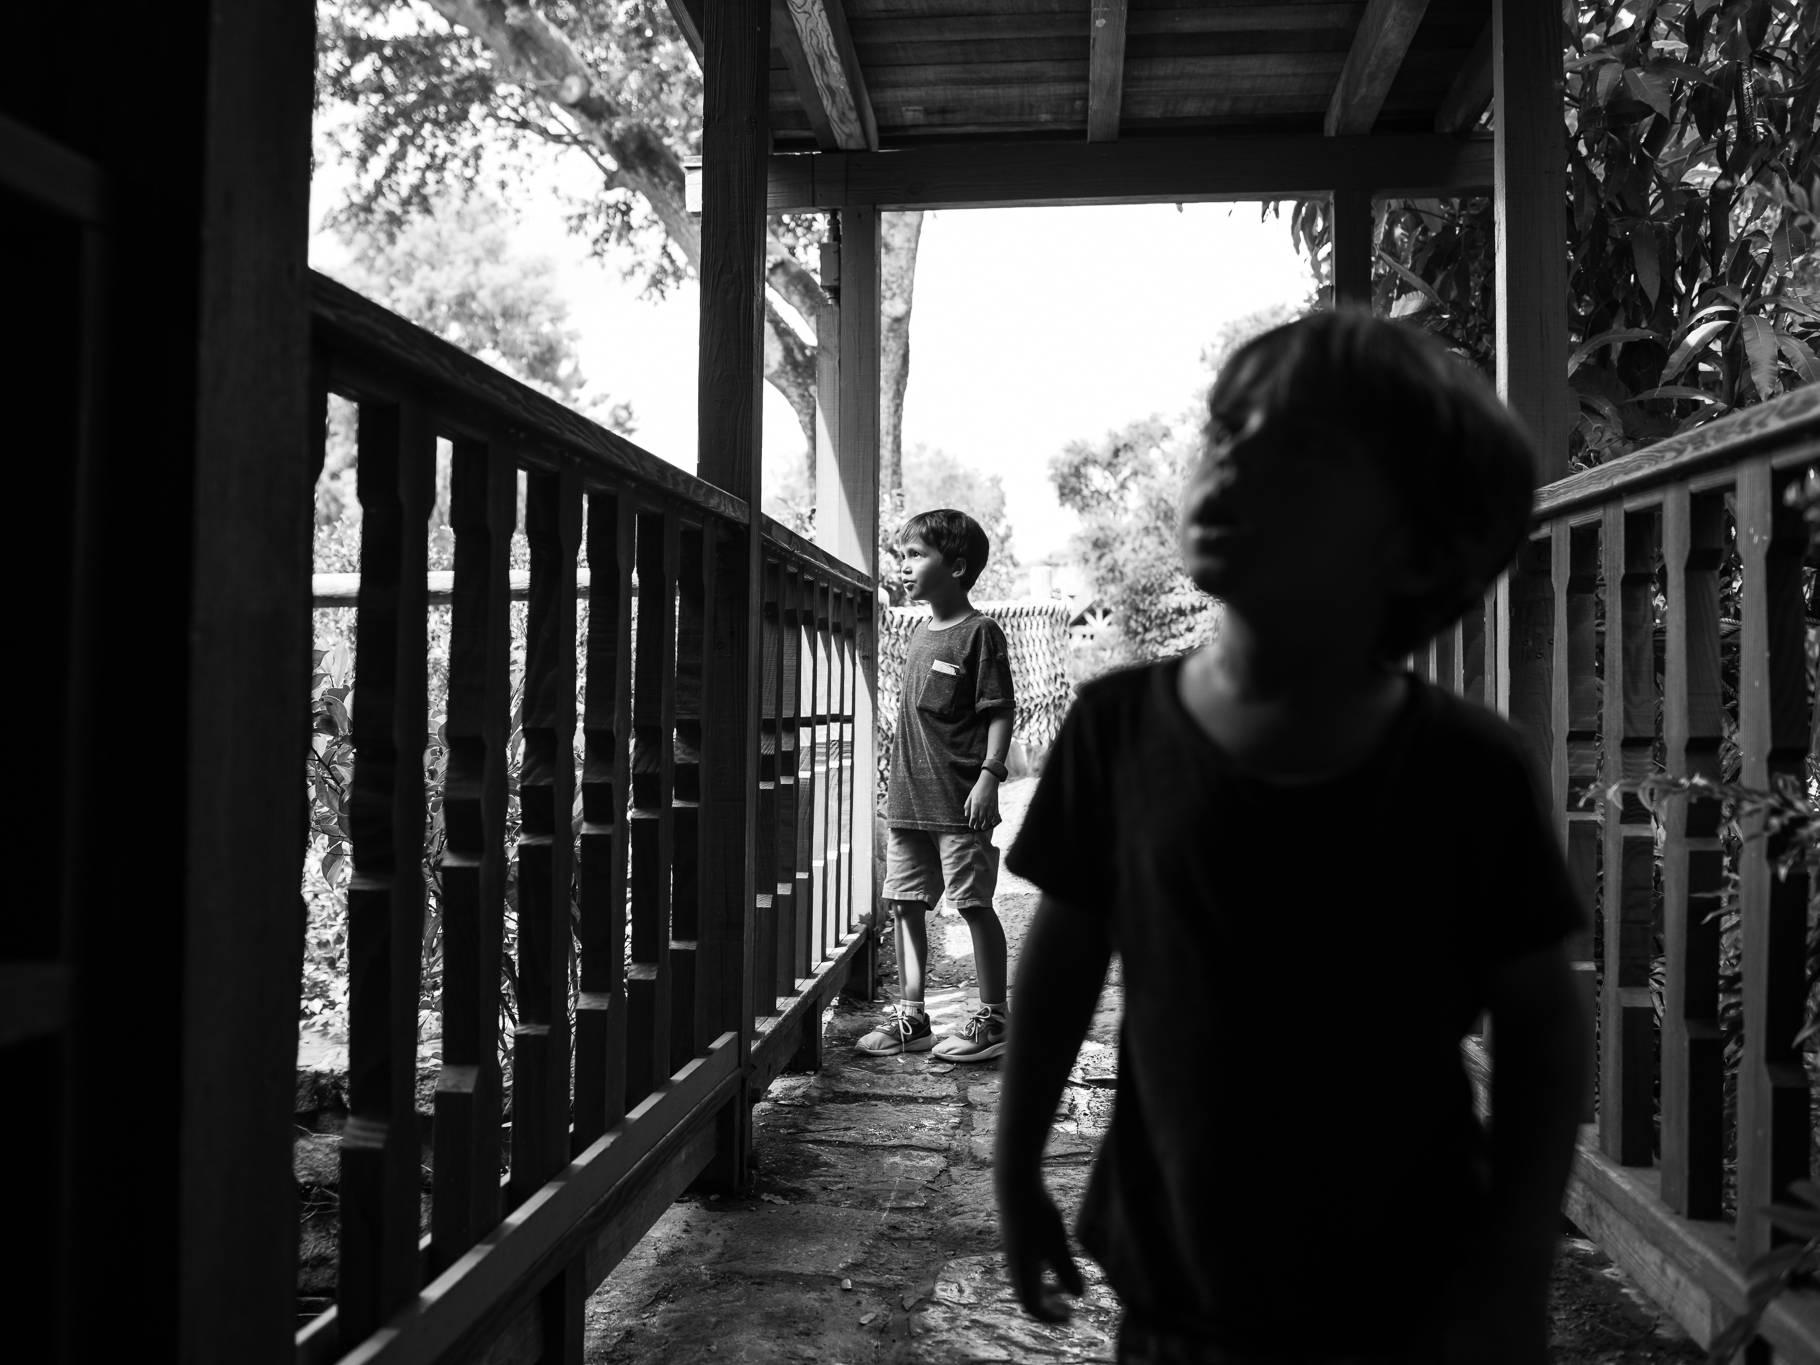 boys explore Tom Sawyer Island inside the Magic Kingdom